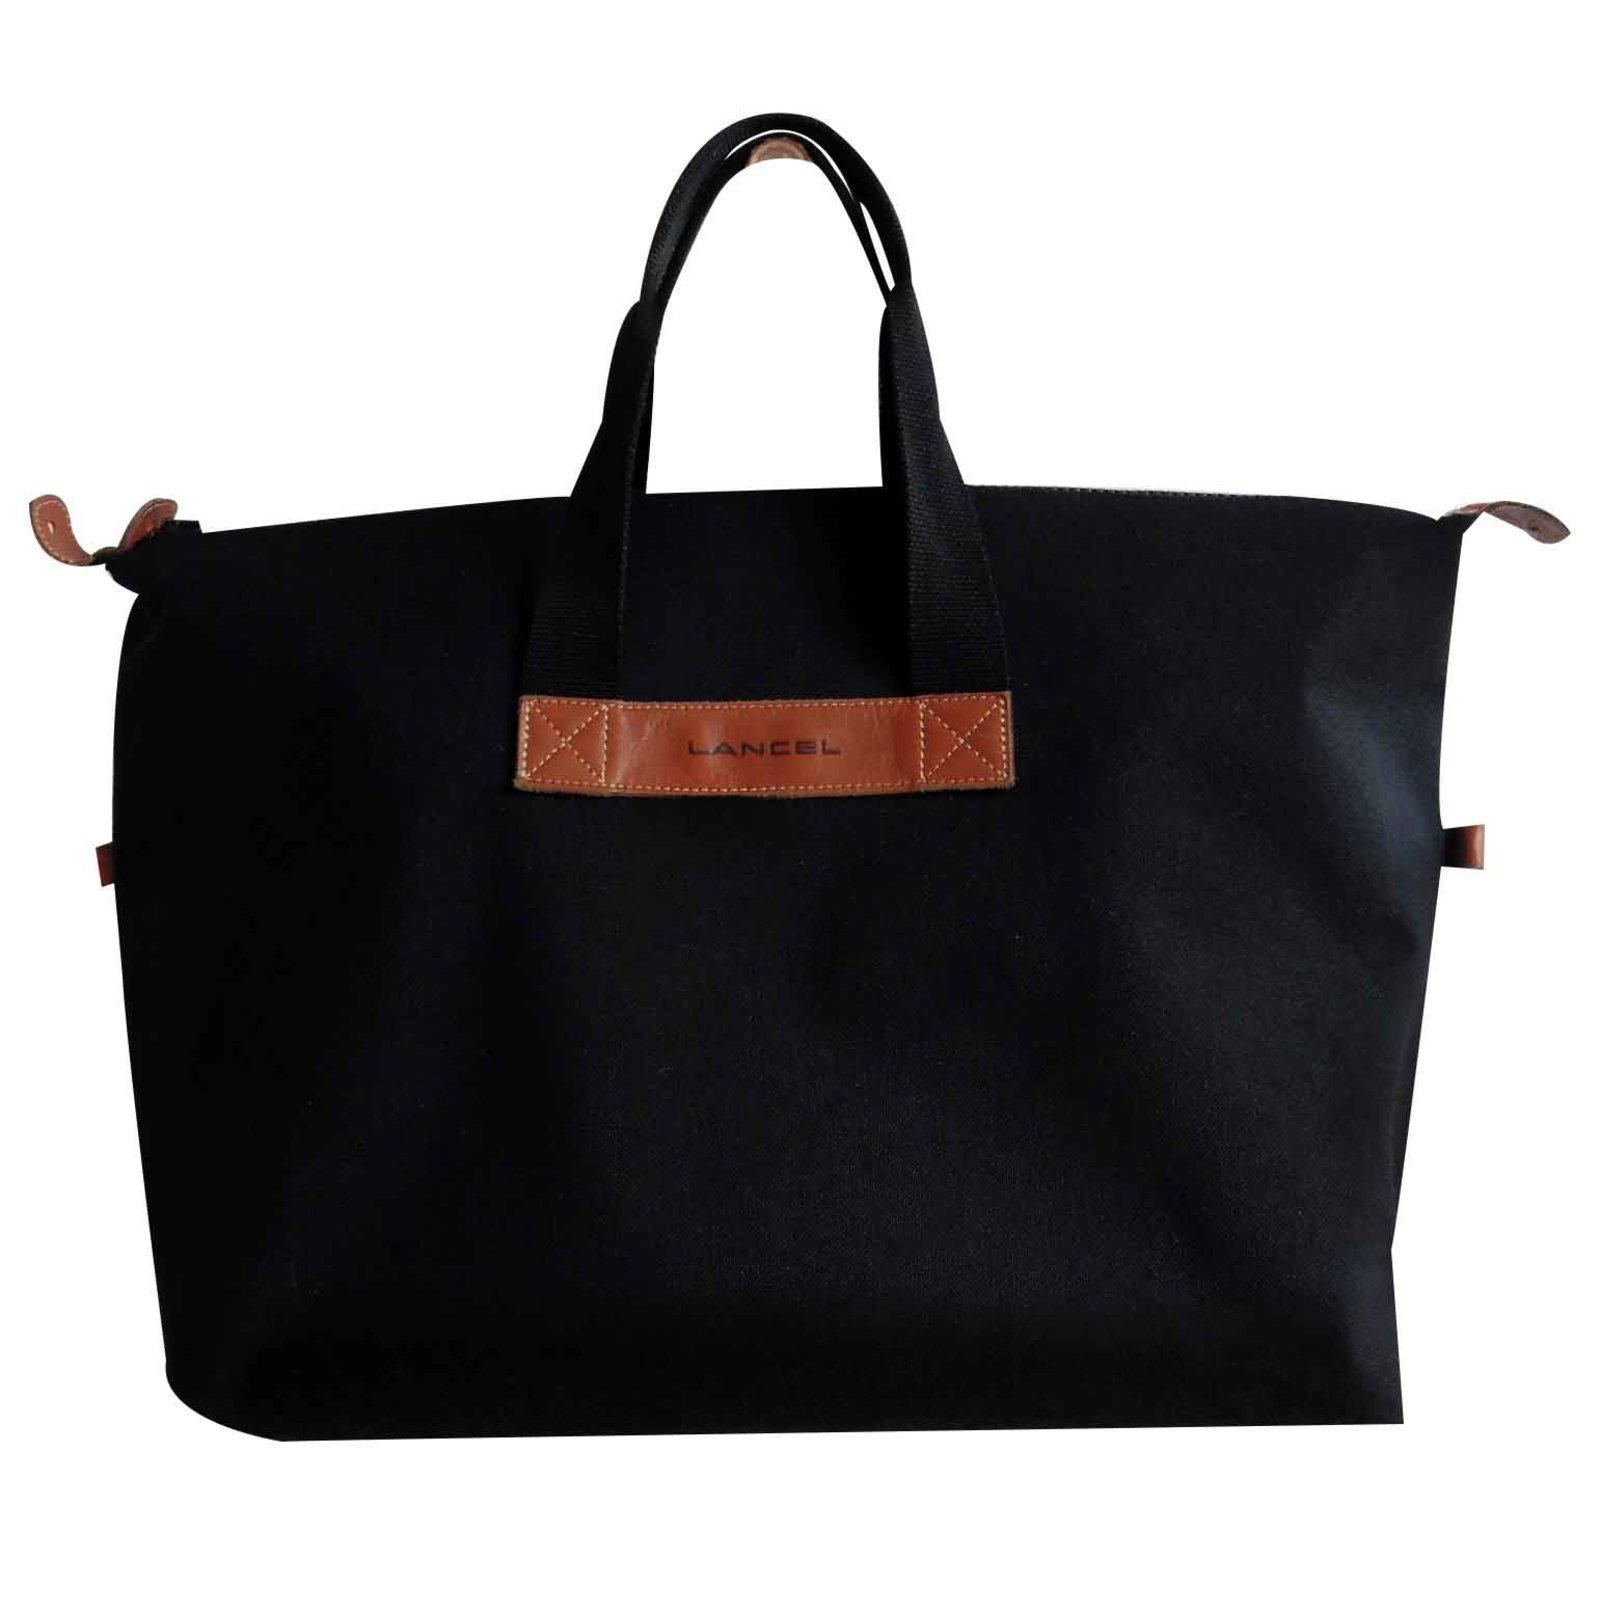 sac lancel de voyage